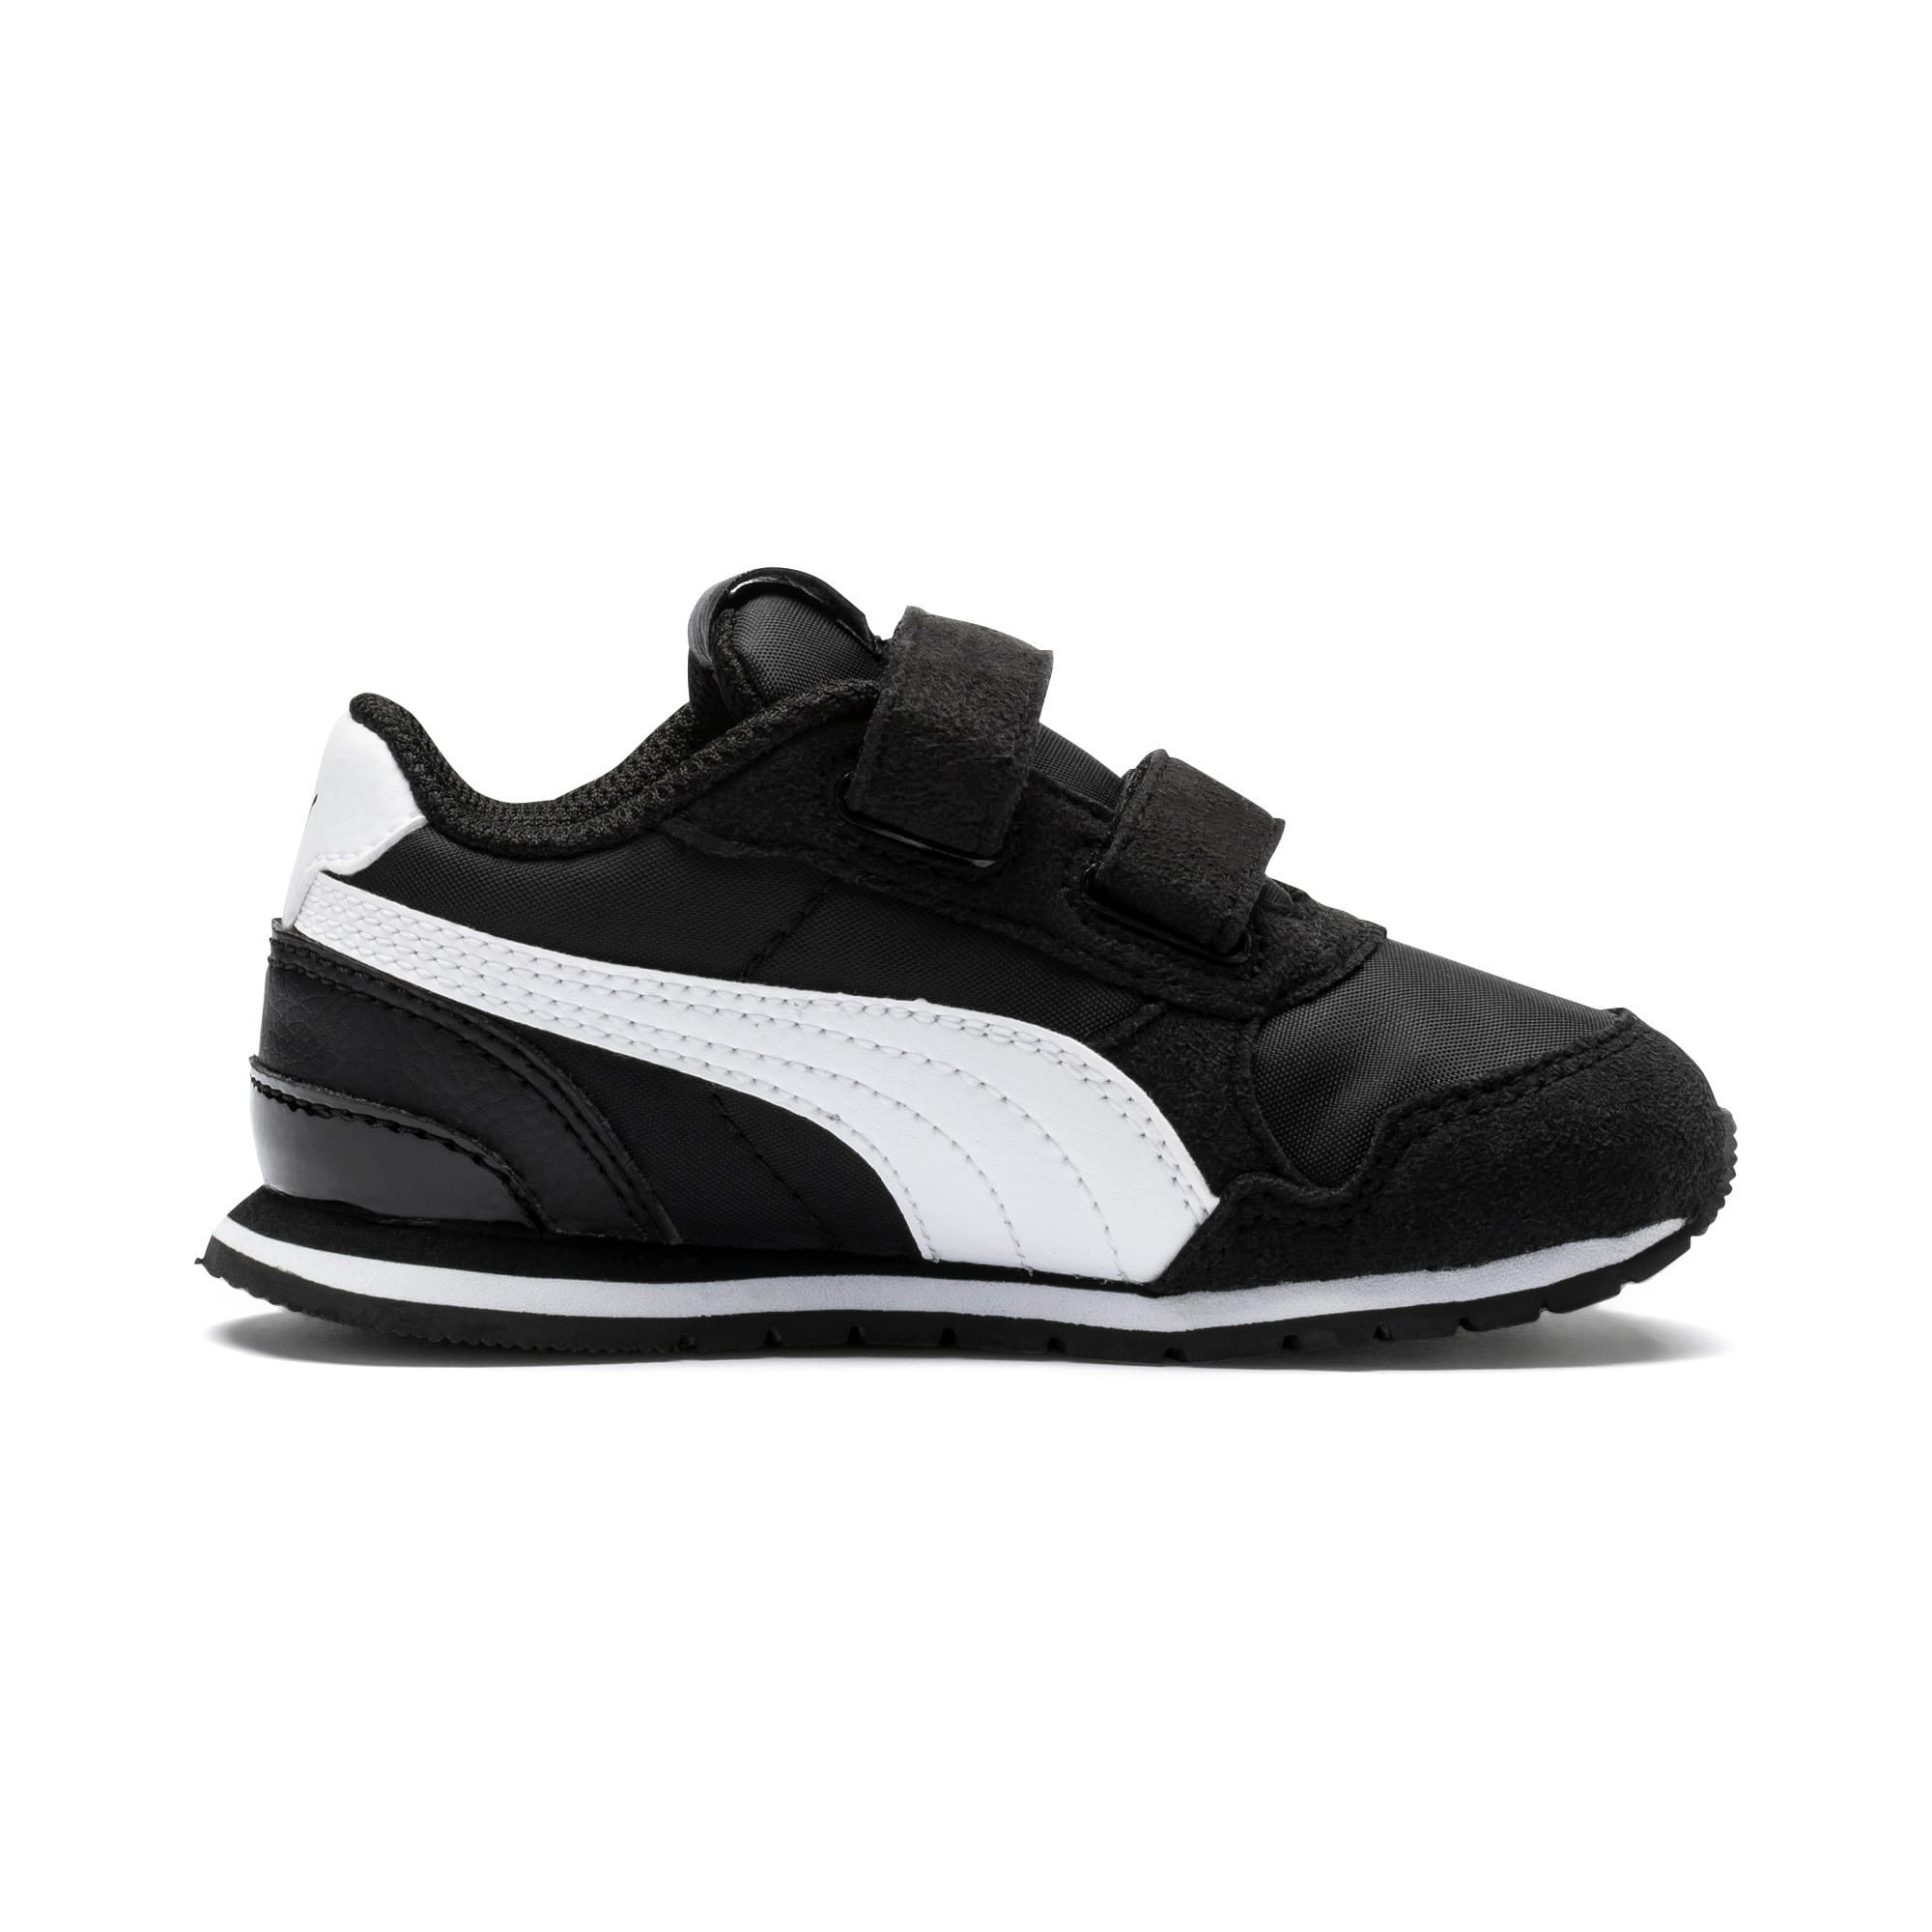 Thumbnail 5 of ST Runner v2 Little Kids' Shoes, Puma Black-Puma White, medium